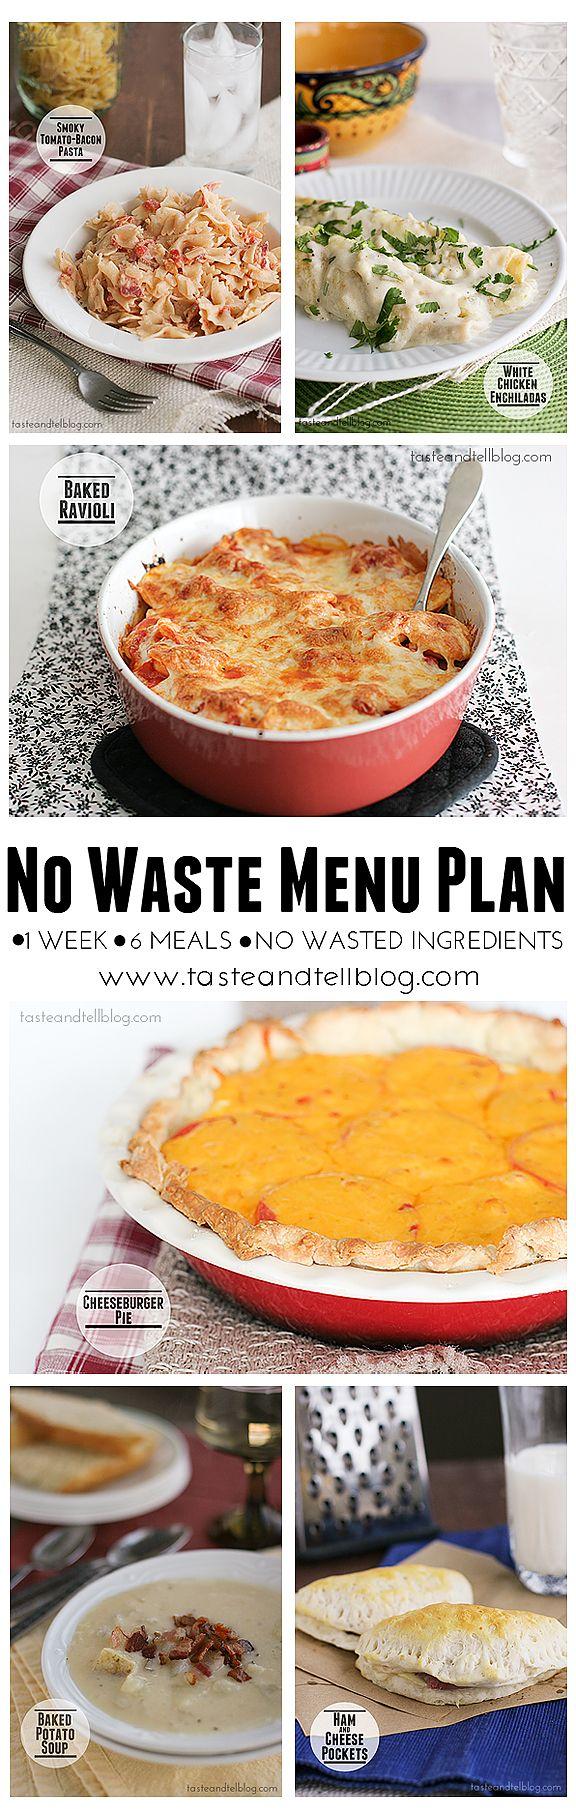 No Waste Menu Plan - 1 week, 6 meals, no leftover ingredients!   www.tasteandtellblog.com #menuplan #recipe #grocerylist